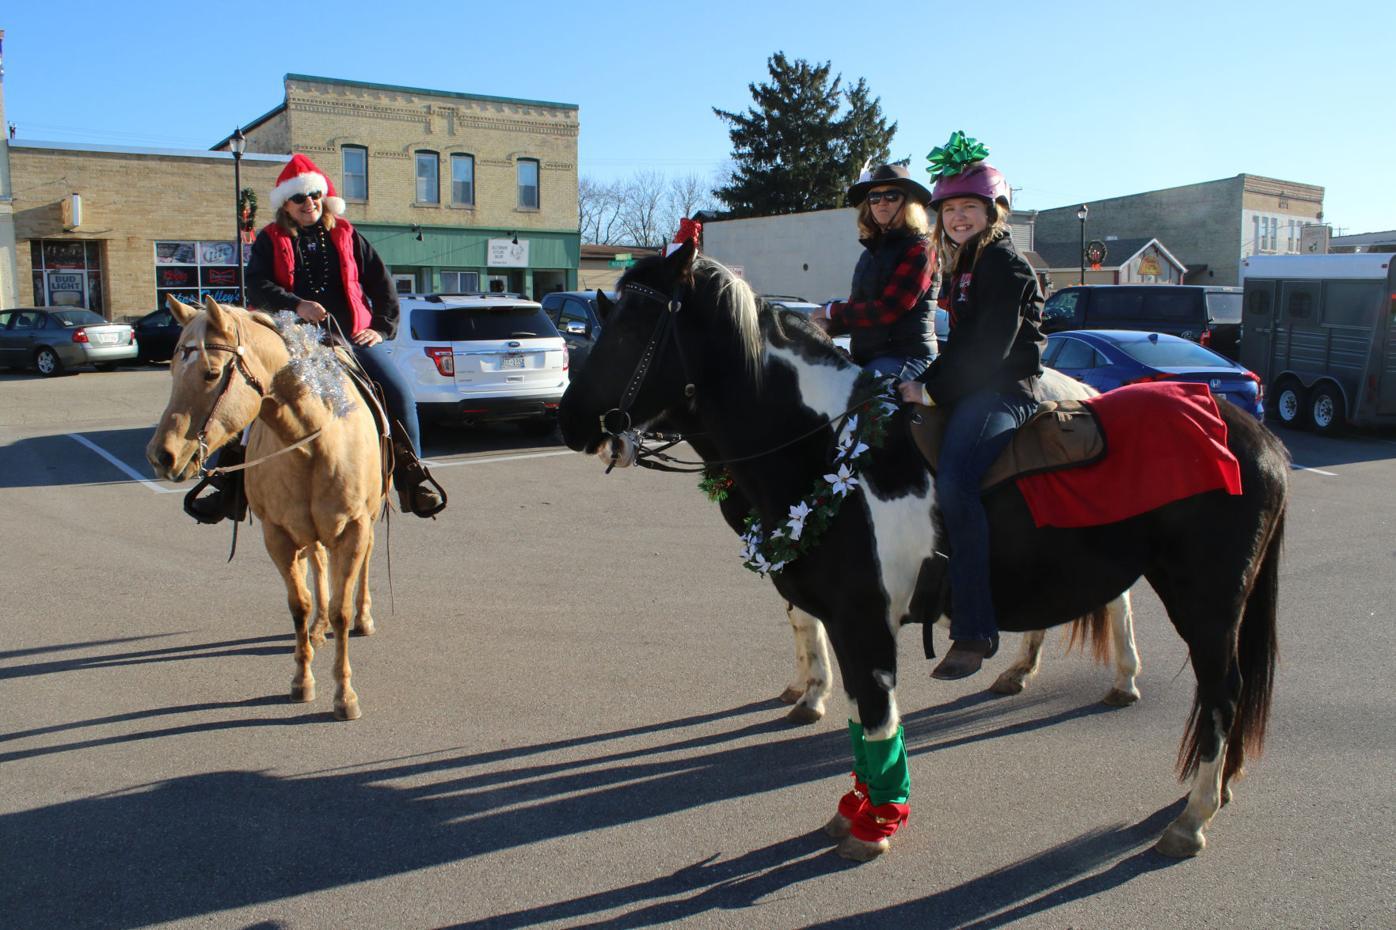 Carolers on horseback 1